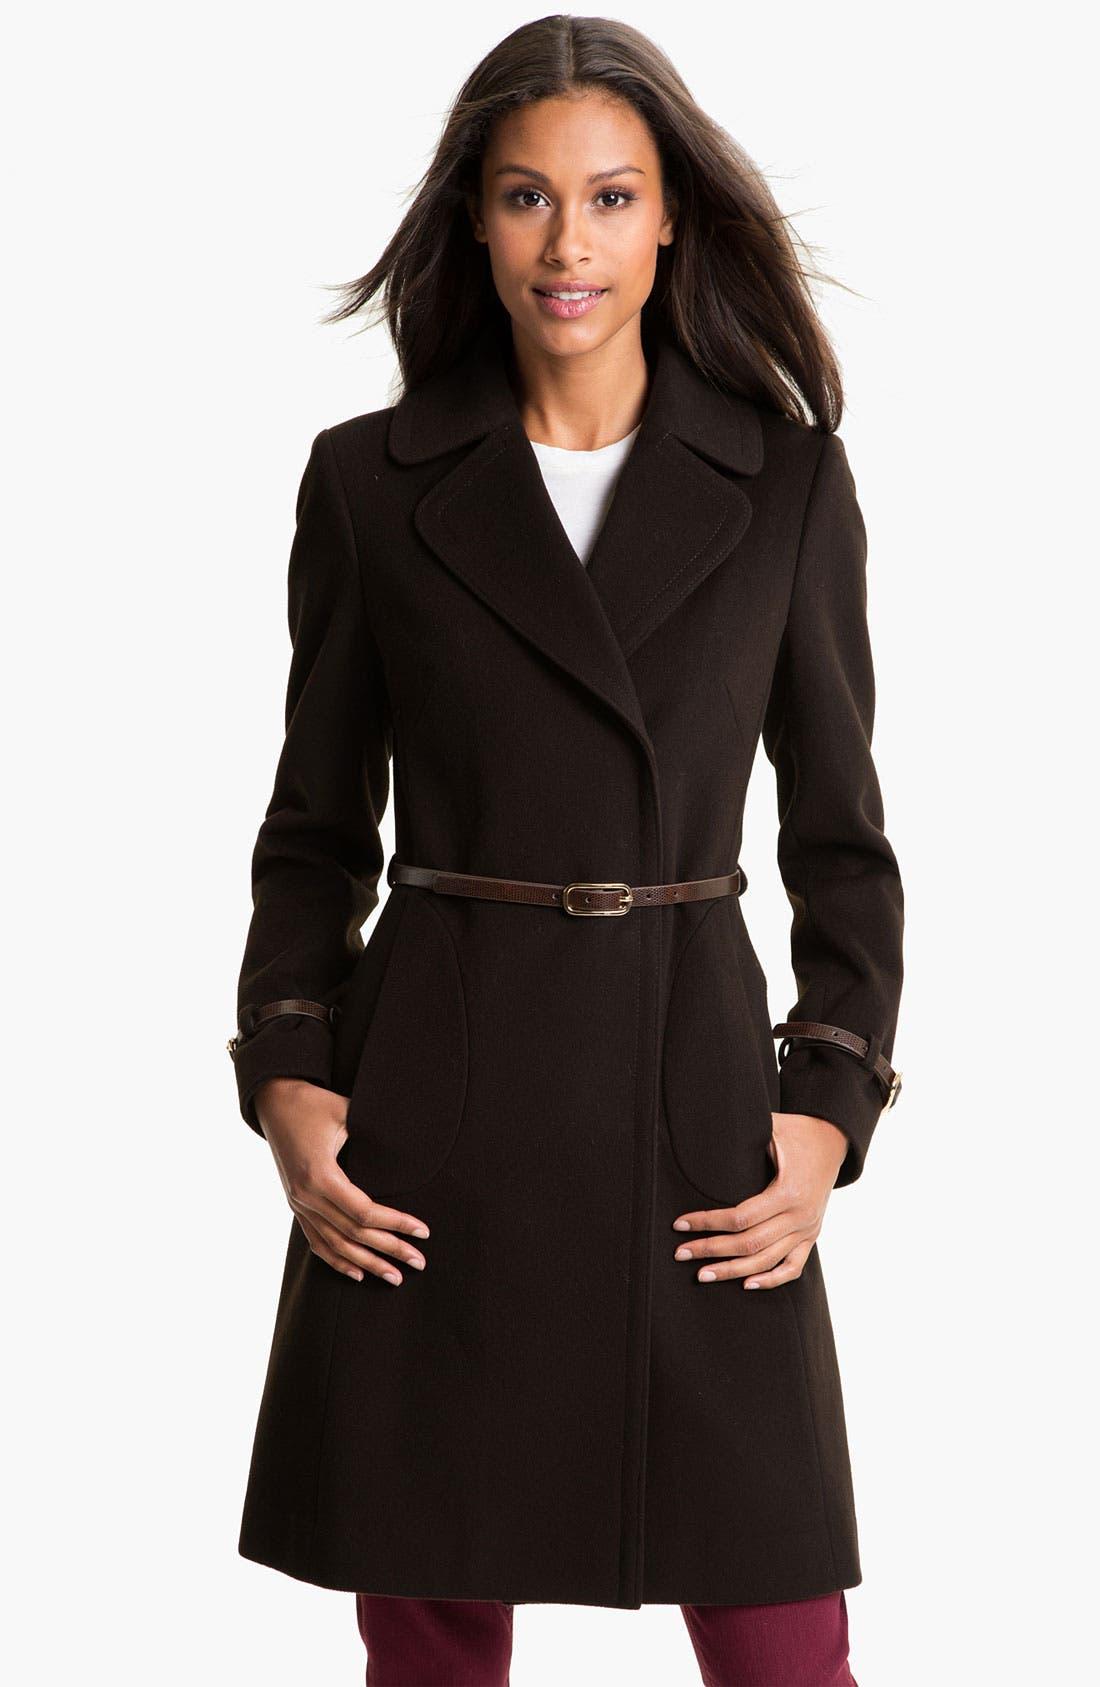 Main Image - Via Spiga 'Kate' Belted Notch Collar Coat